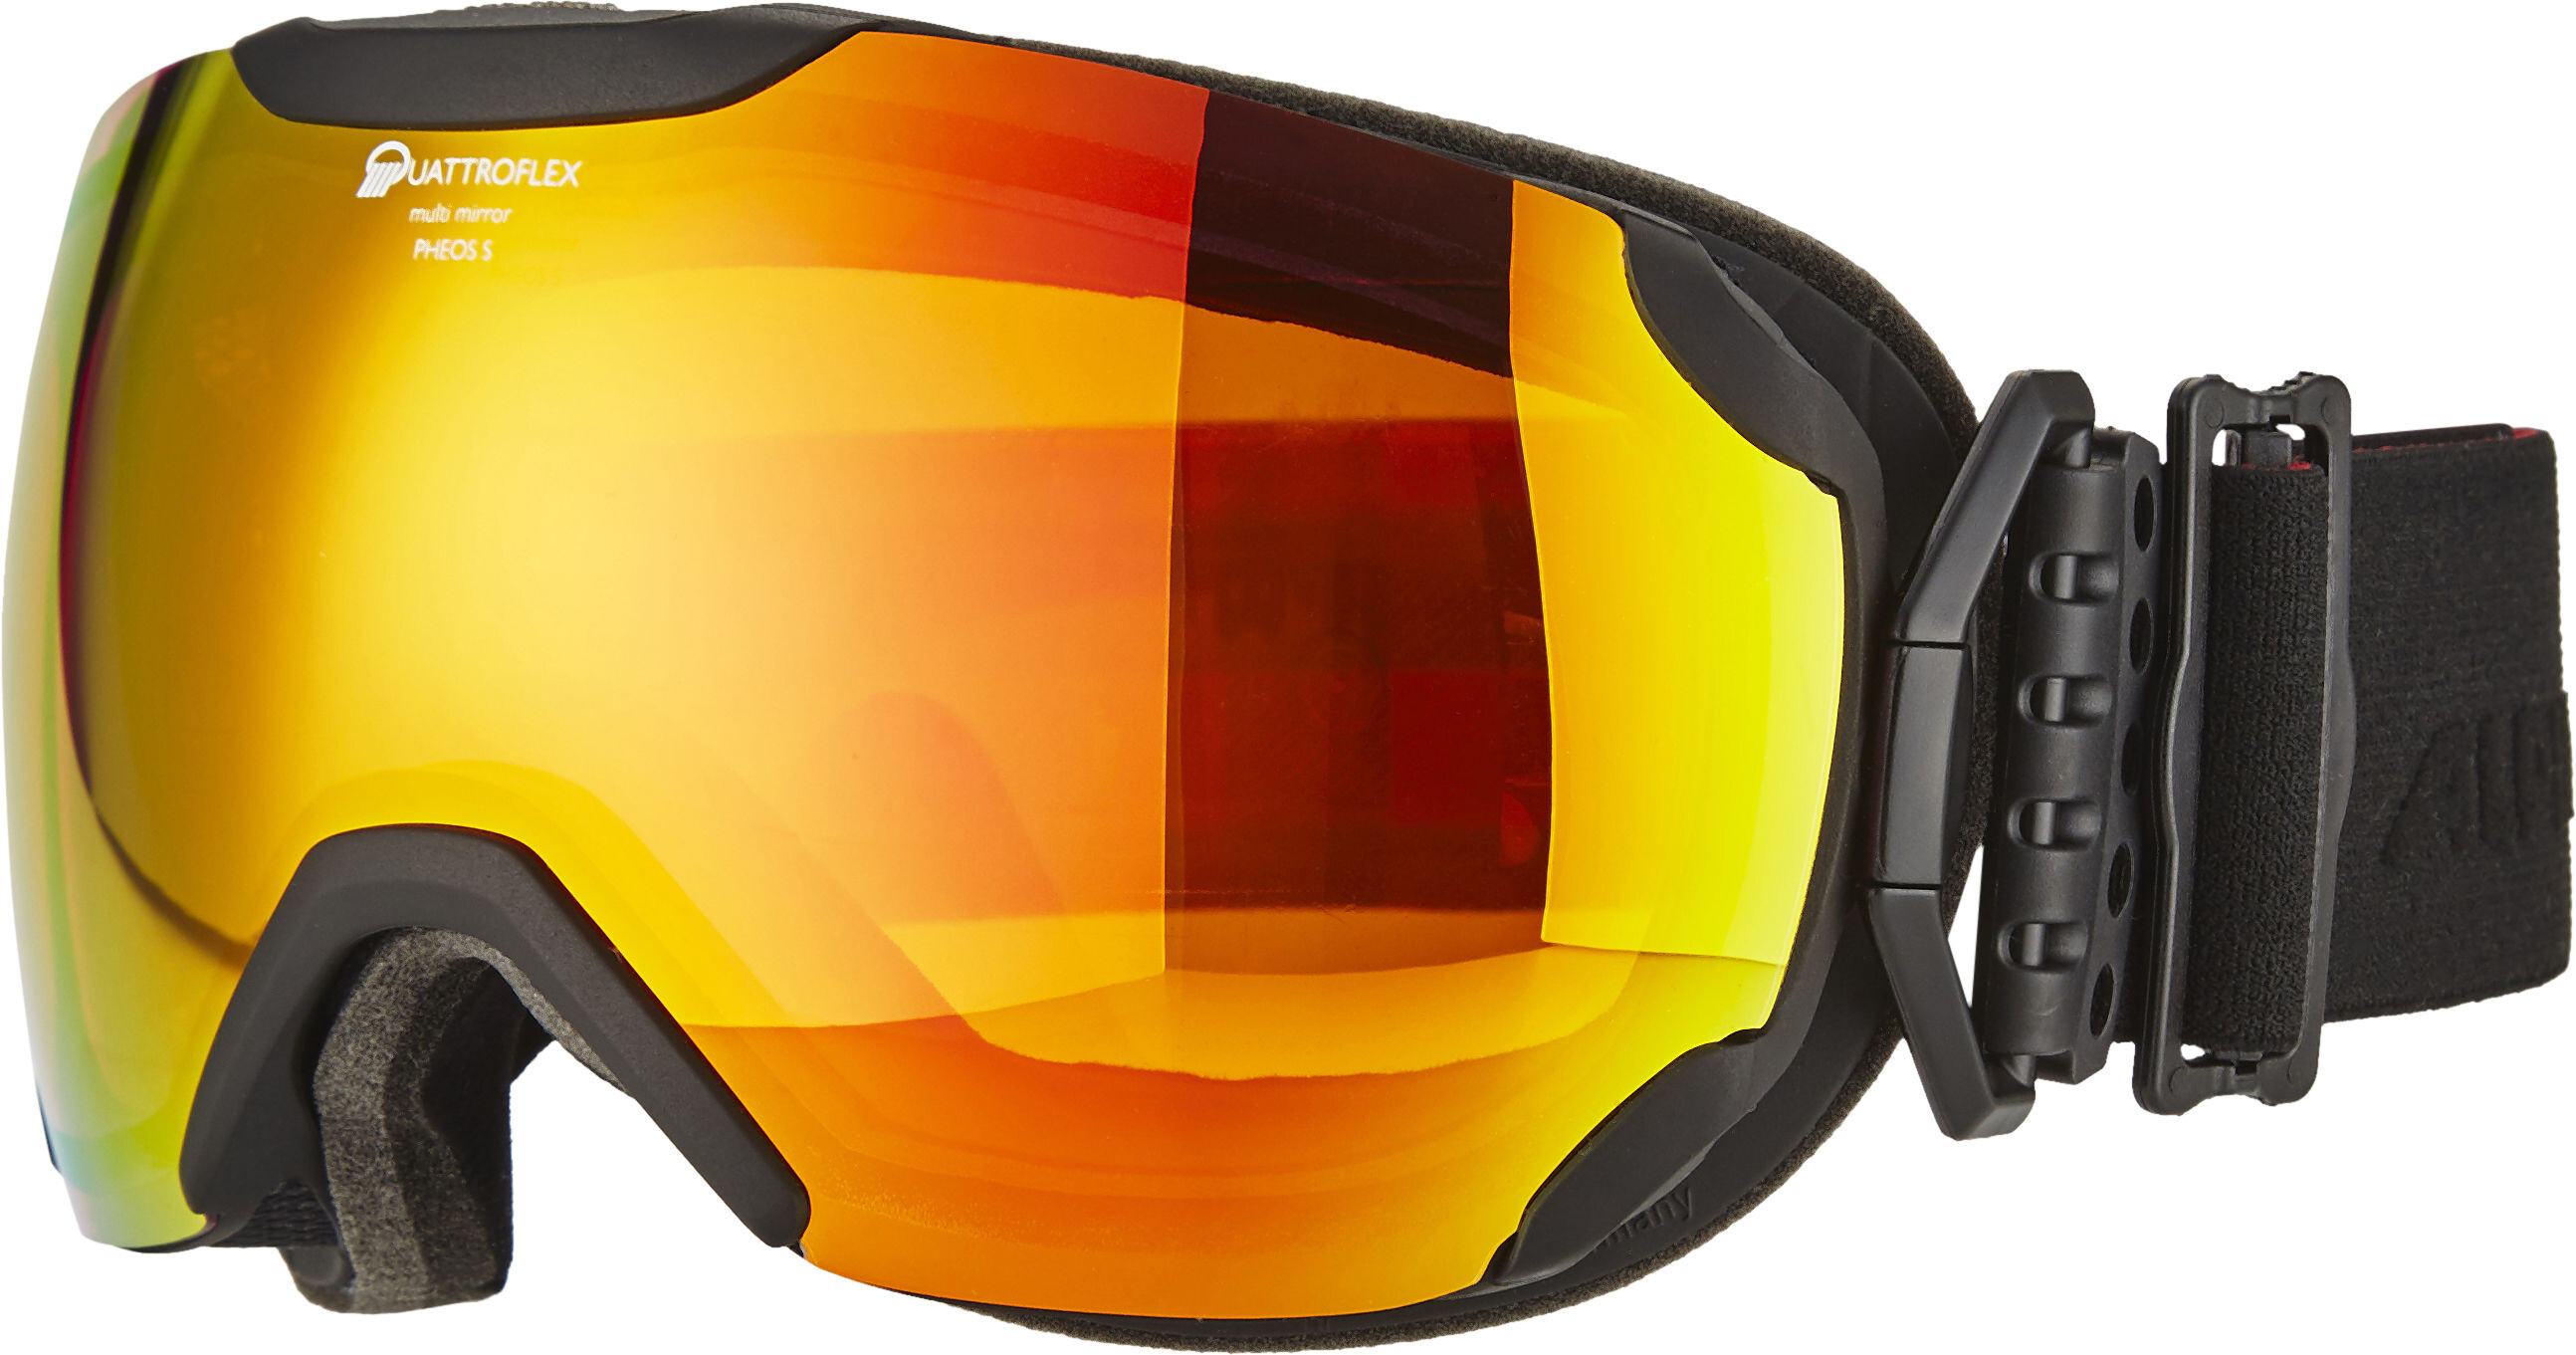 Alpina Pheos S QMM SPH Goggles S Redblack At Addnaturecouk - Alpina goggles